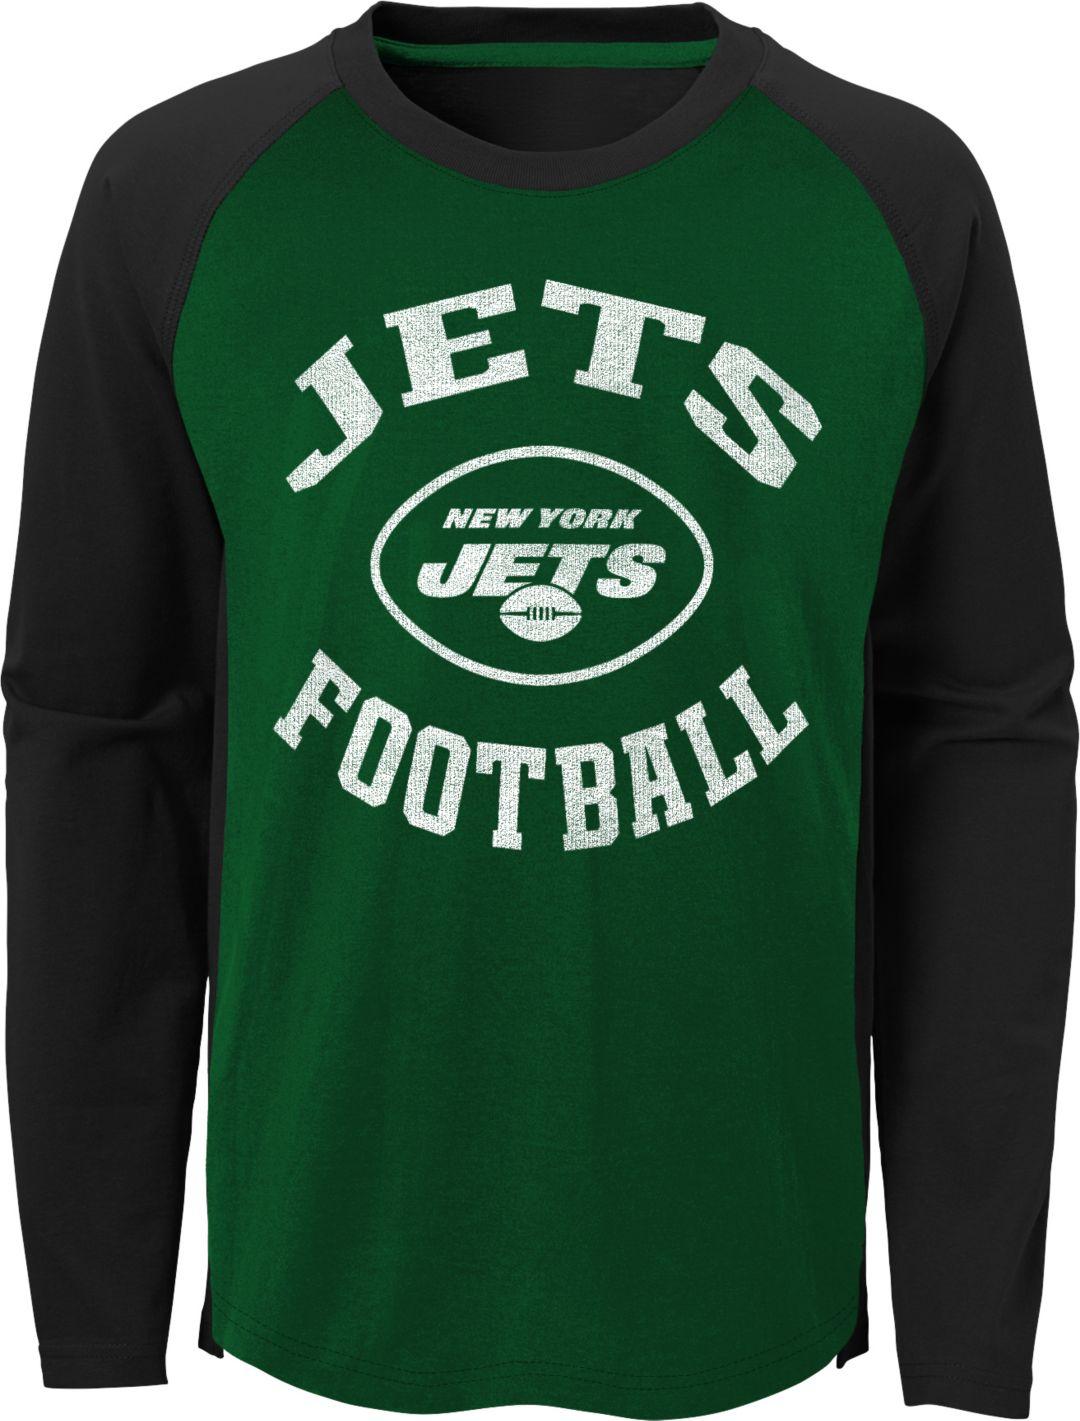 afbcb959 NFL Team Apparel Youth New York Jets Air Raid Long Sleeve Green Shirt